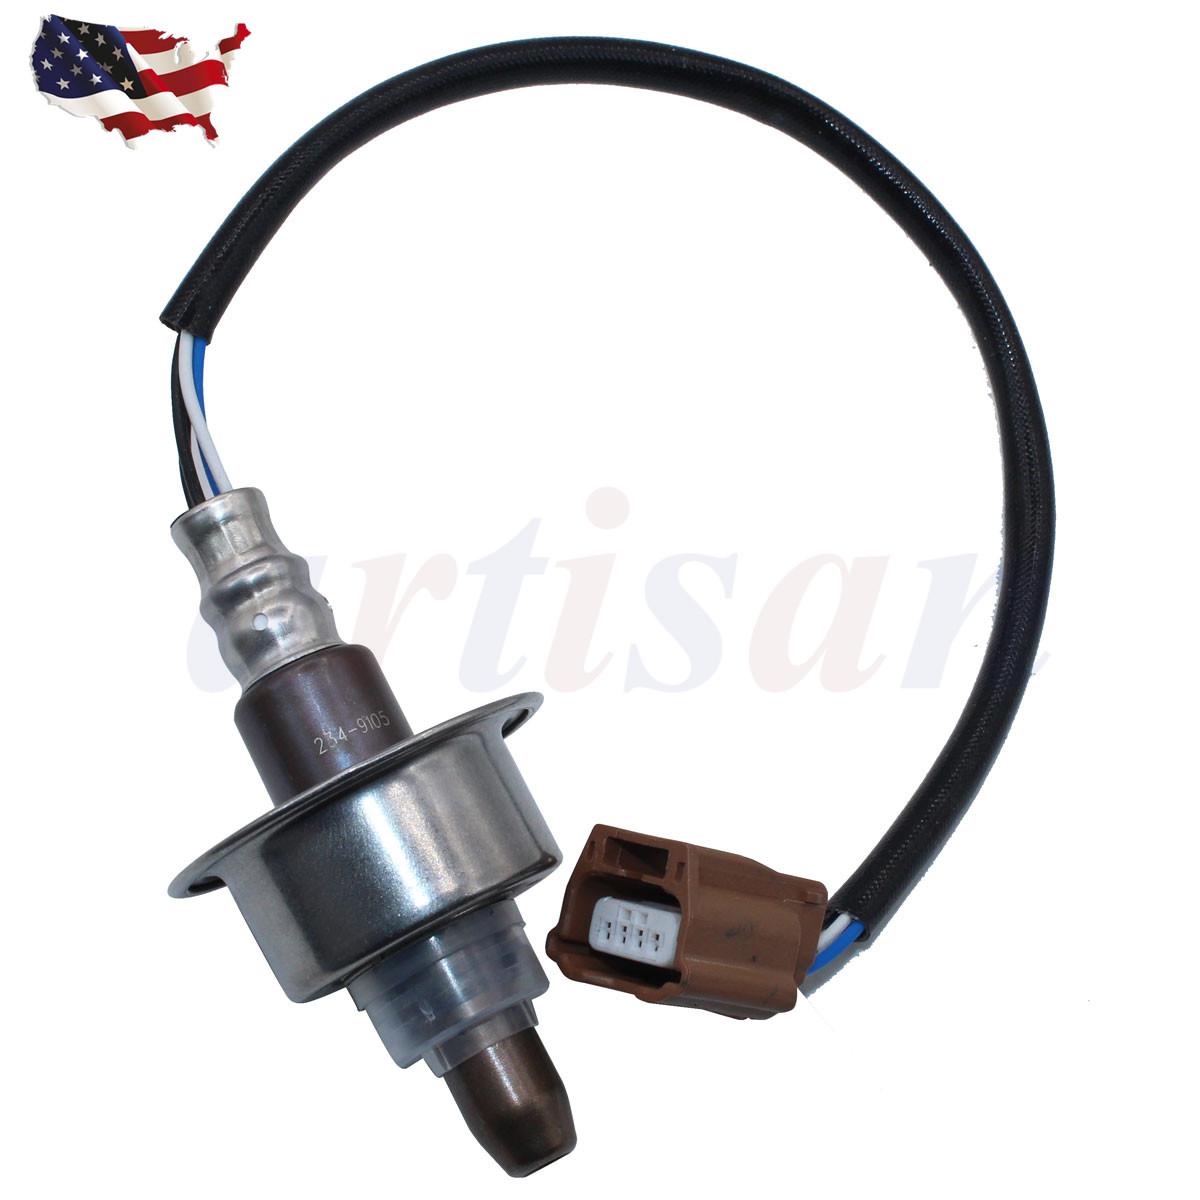 234-9105 Oxygen Sensor Lambda Sensor For 2011-2015 Nissan Juke 1.6L 211500-7530